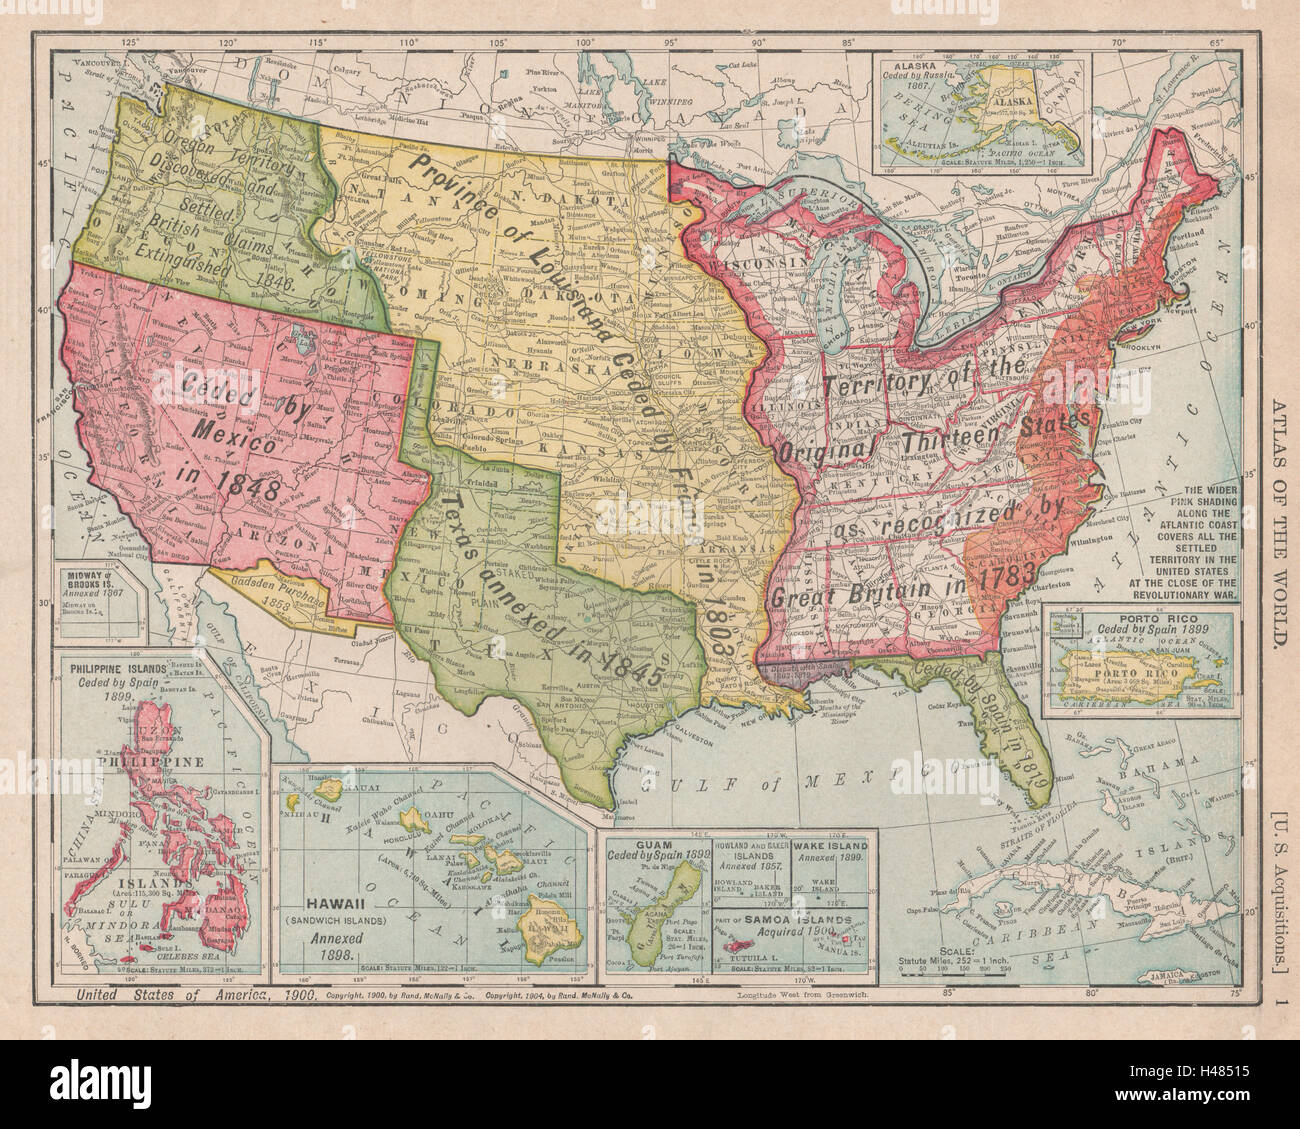 USA territorial development GadsdenLouisiana Purchase RAND